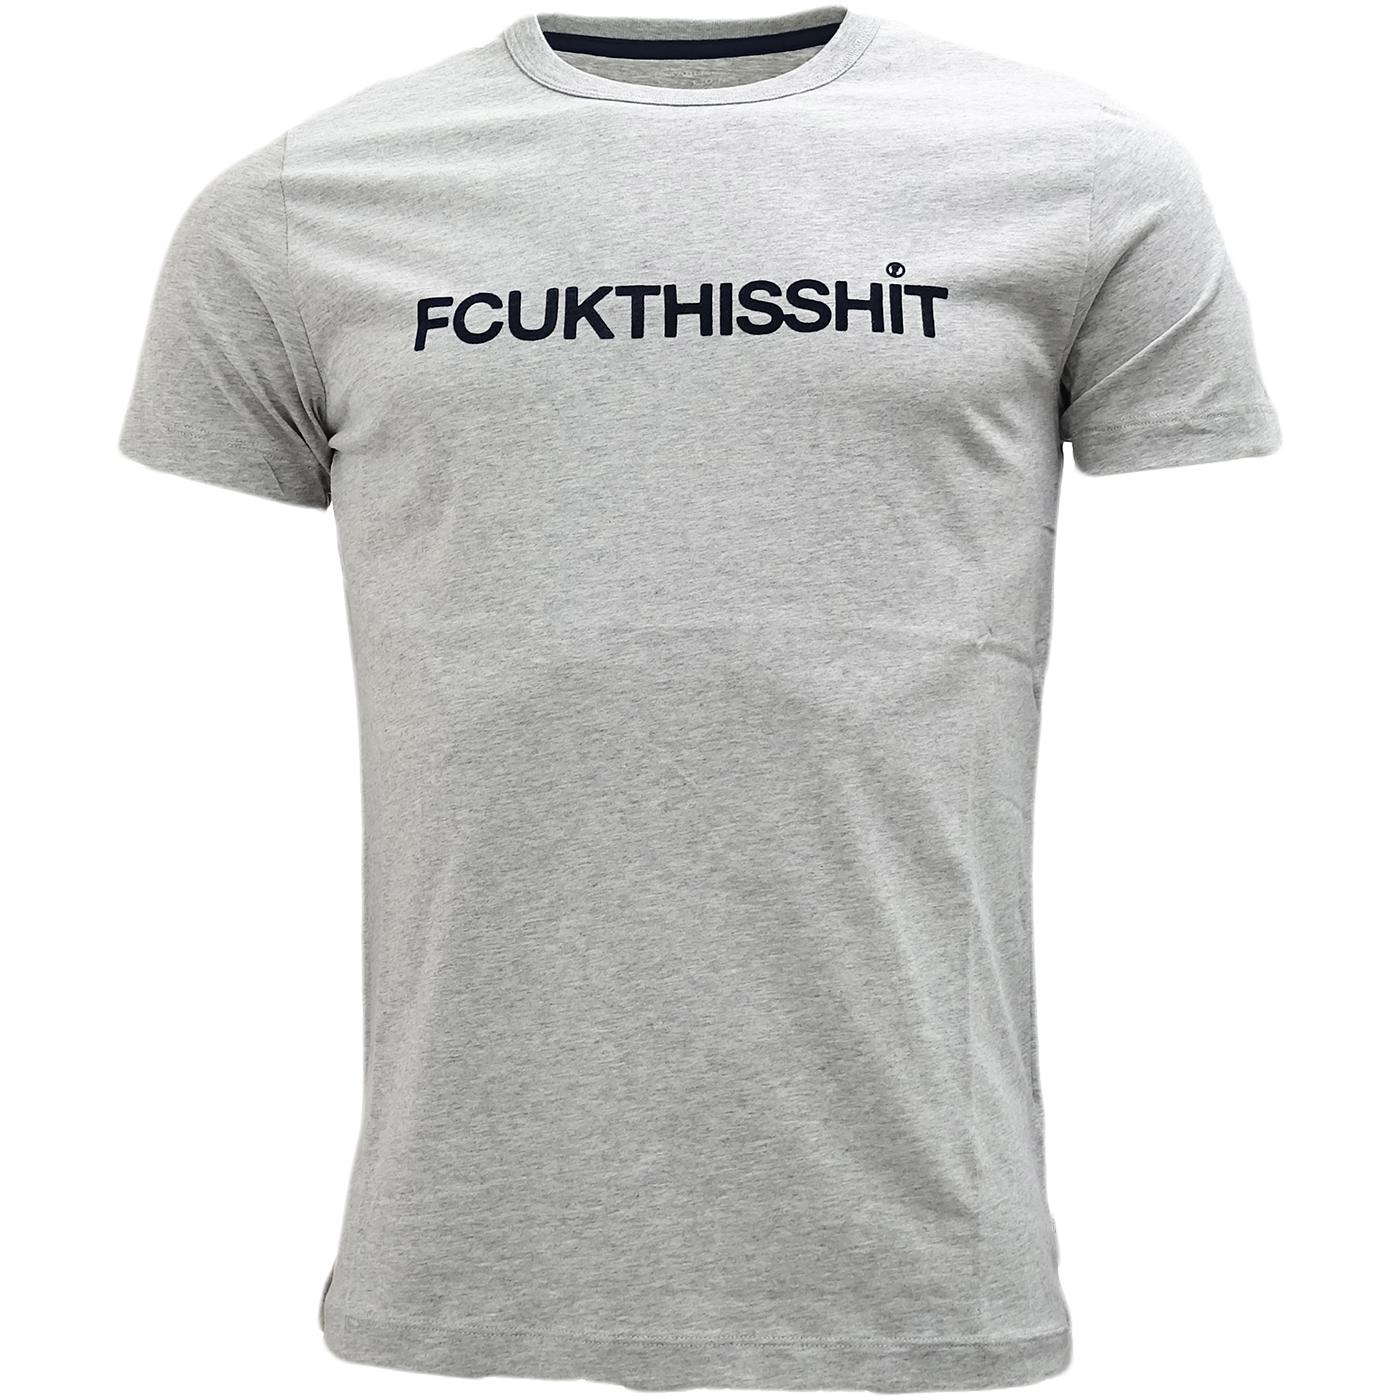 Fcuk T-Shirt 56GEI Grey - 'FCUK THIS S**T'